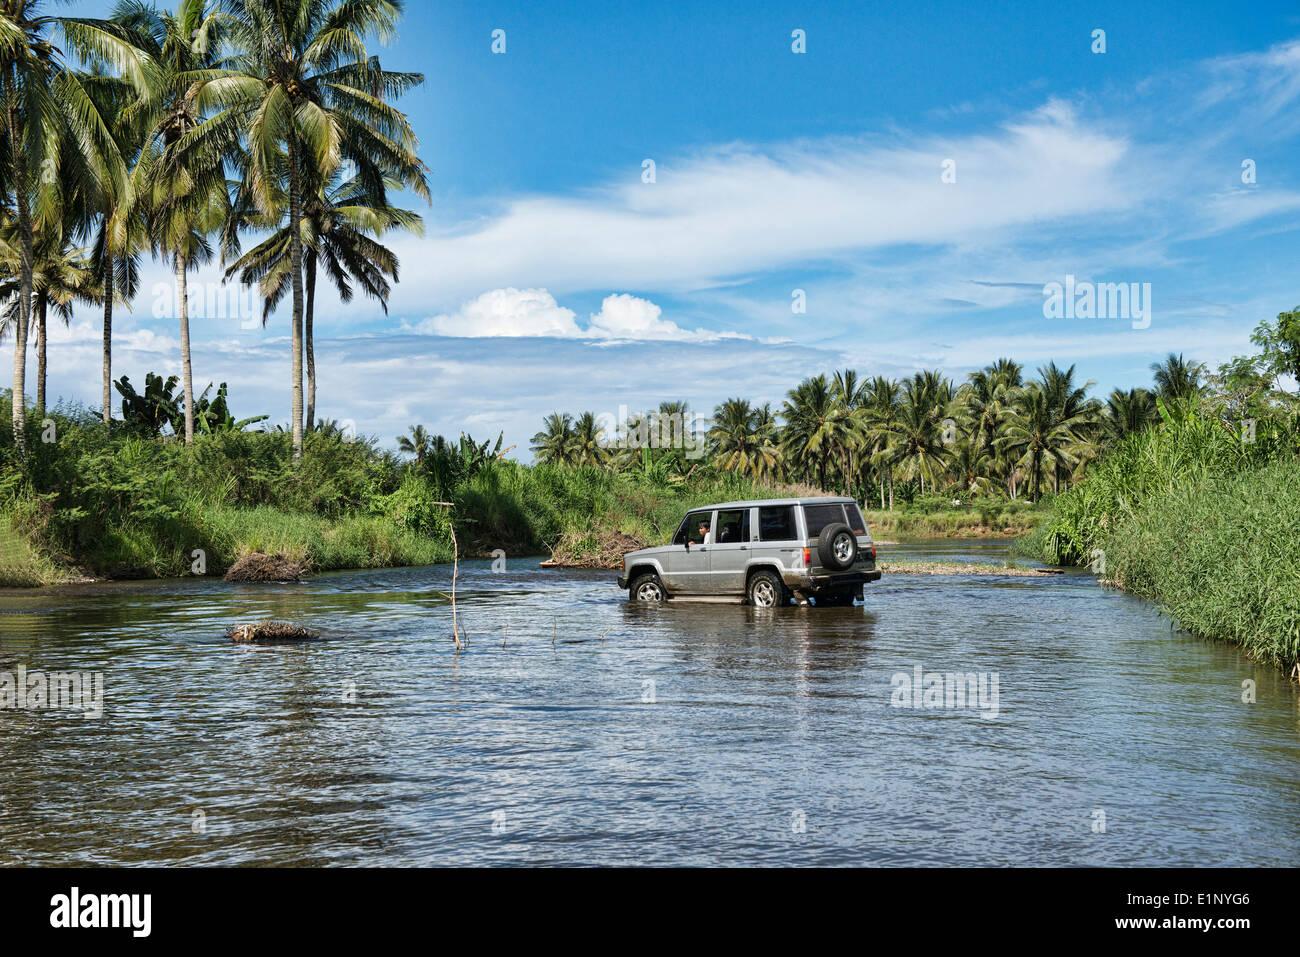 jeep navigating river crossing to Sukamade Beach, Meru Betiri National Park, Java, Indonesia - Stock Image